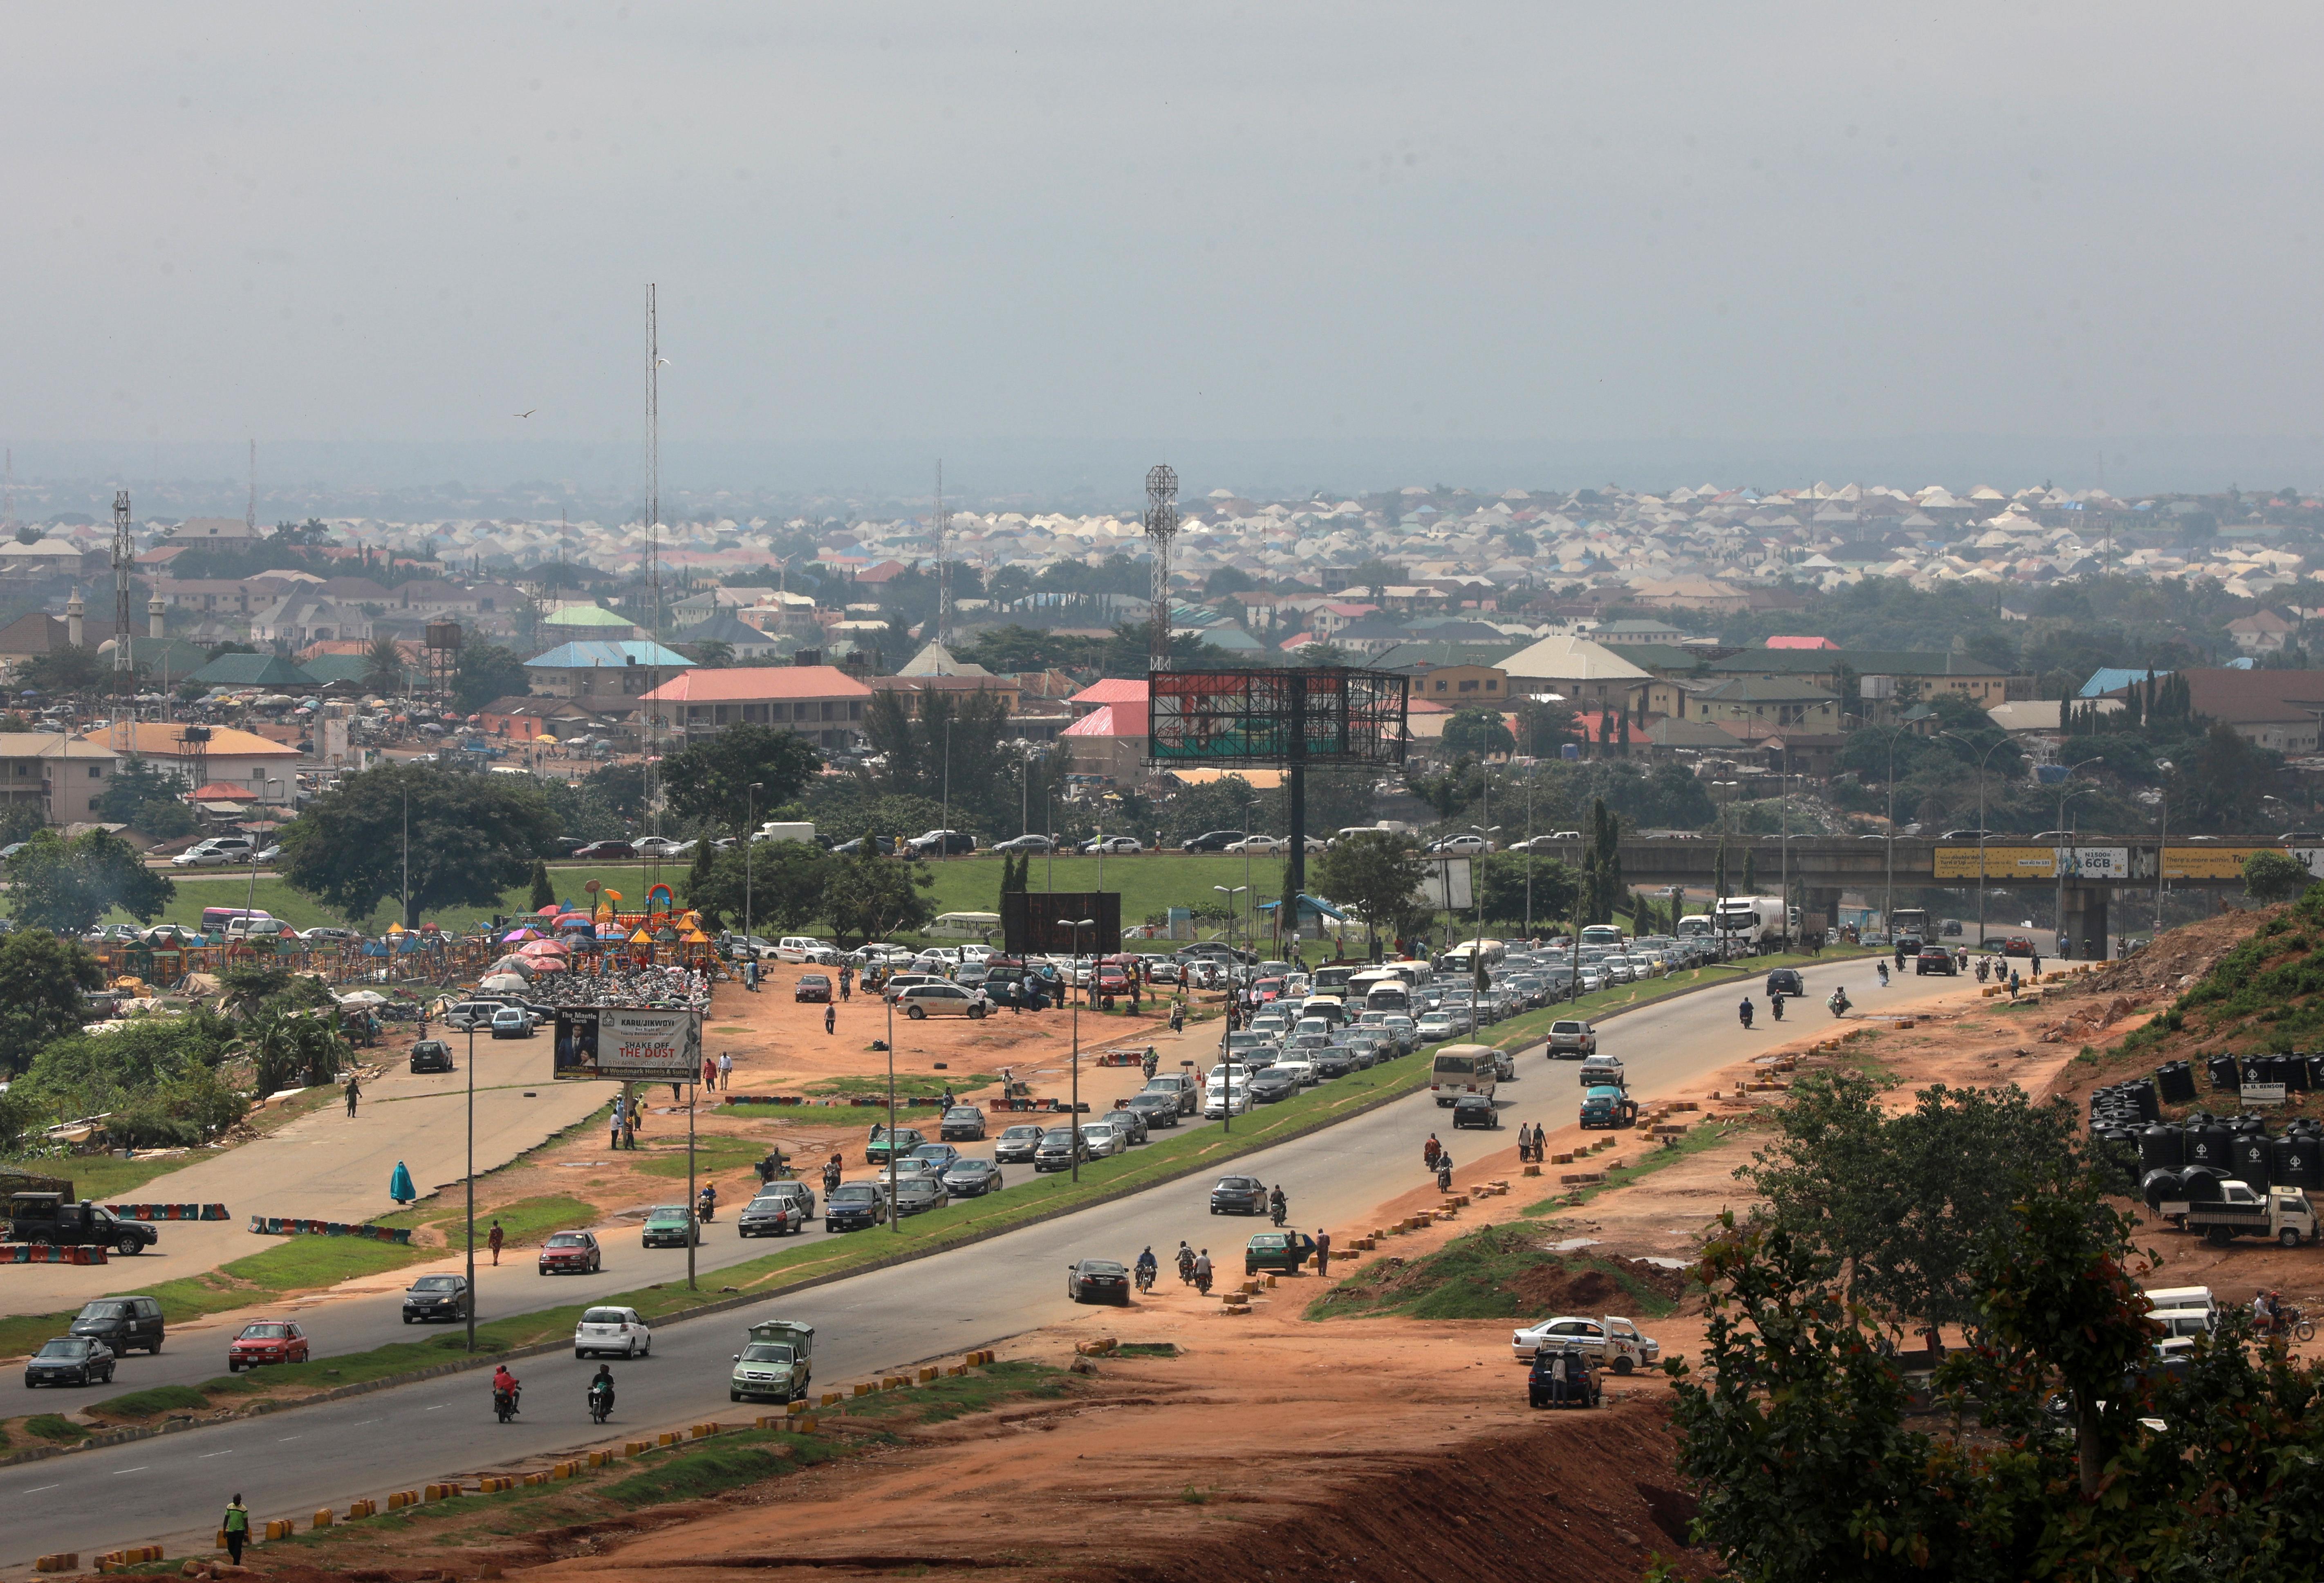 Cars drive along a street in Abuja, Nigeria June 25, 2020. REUTERS/Afolabi Sotunde